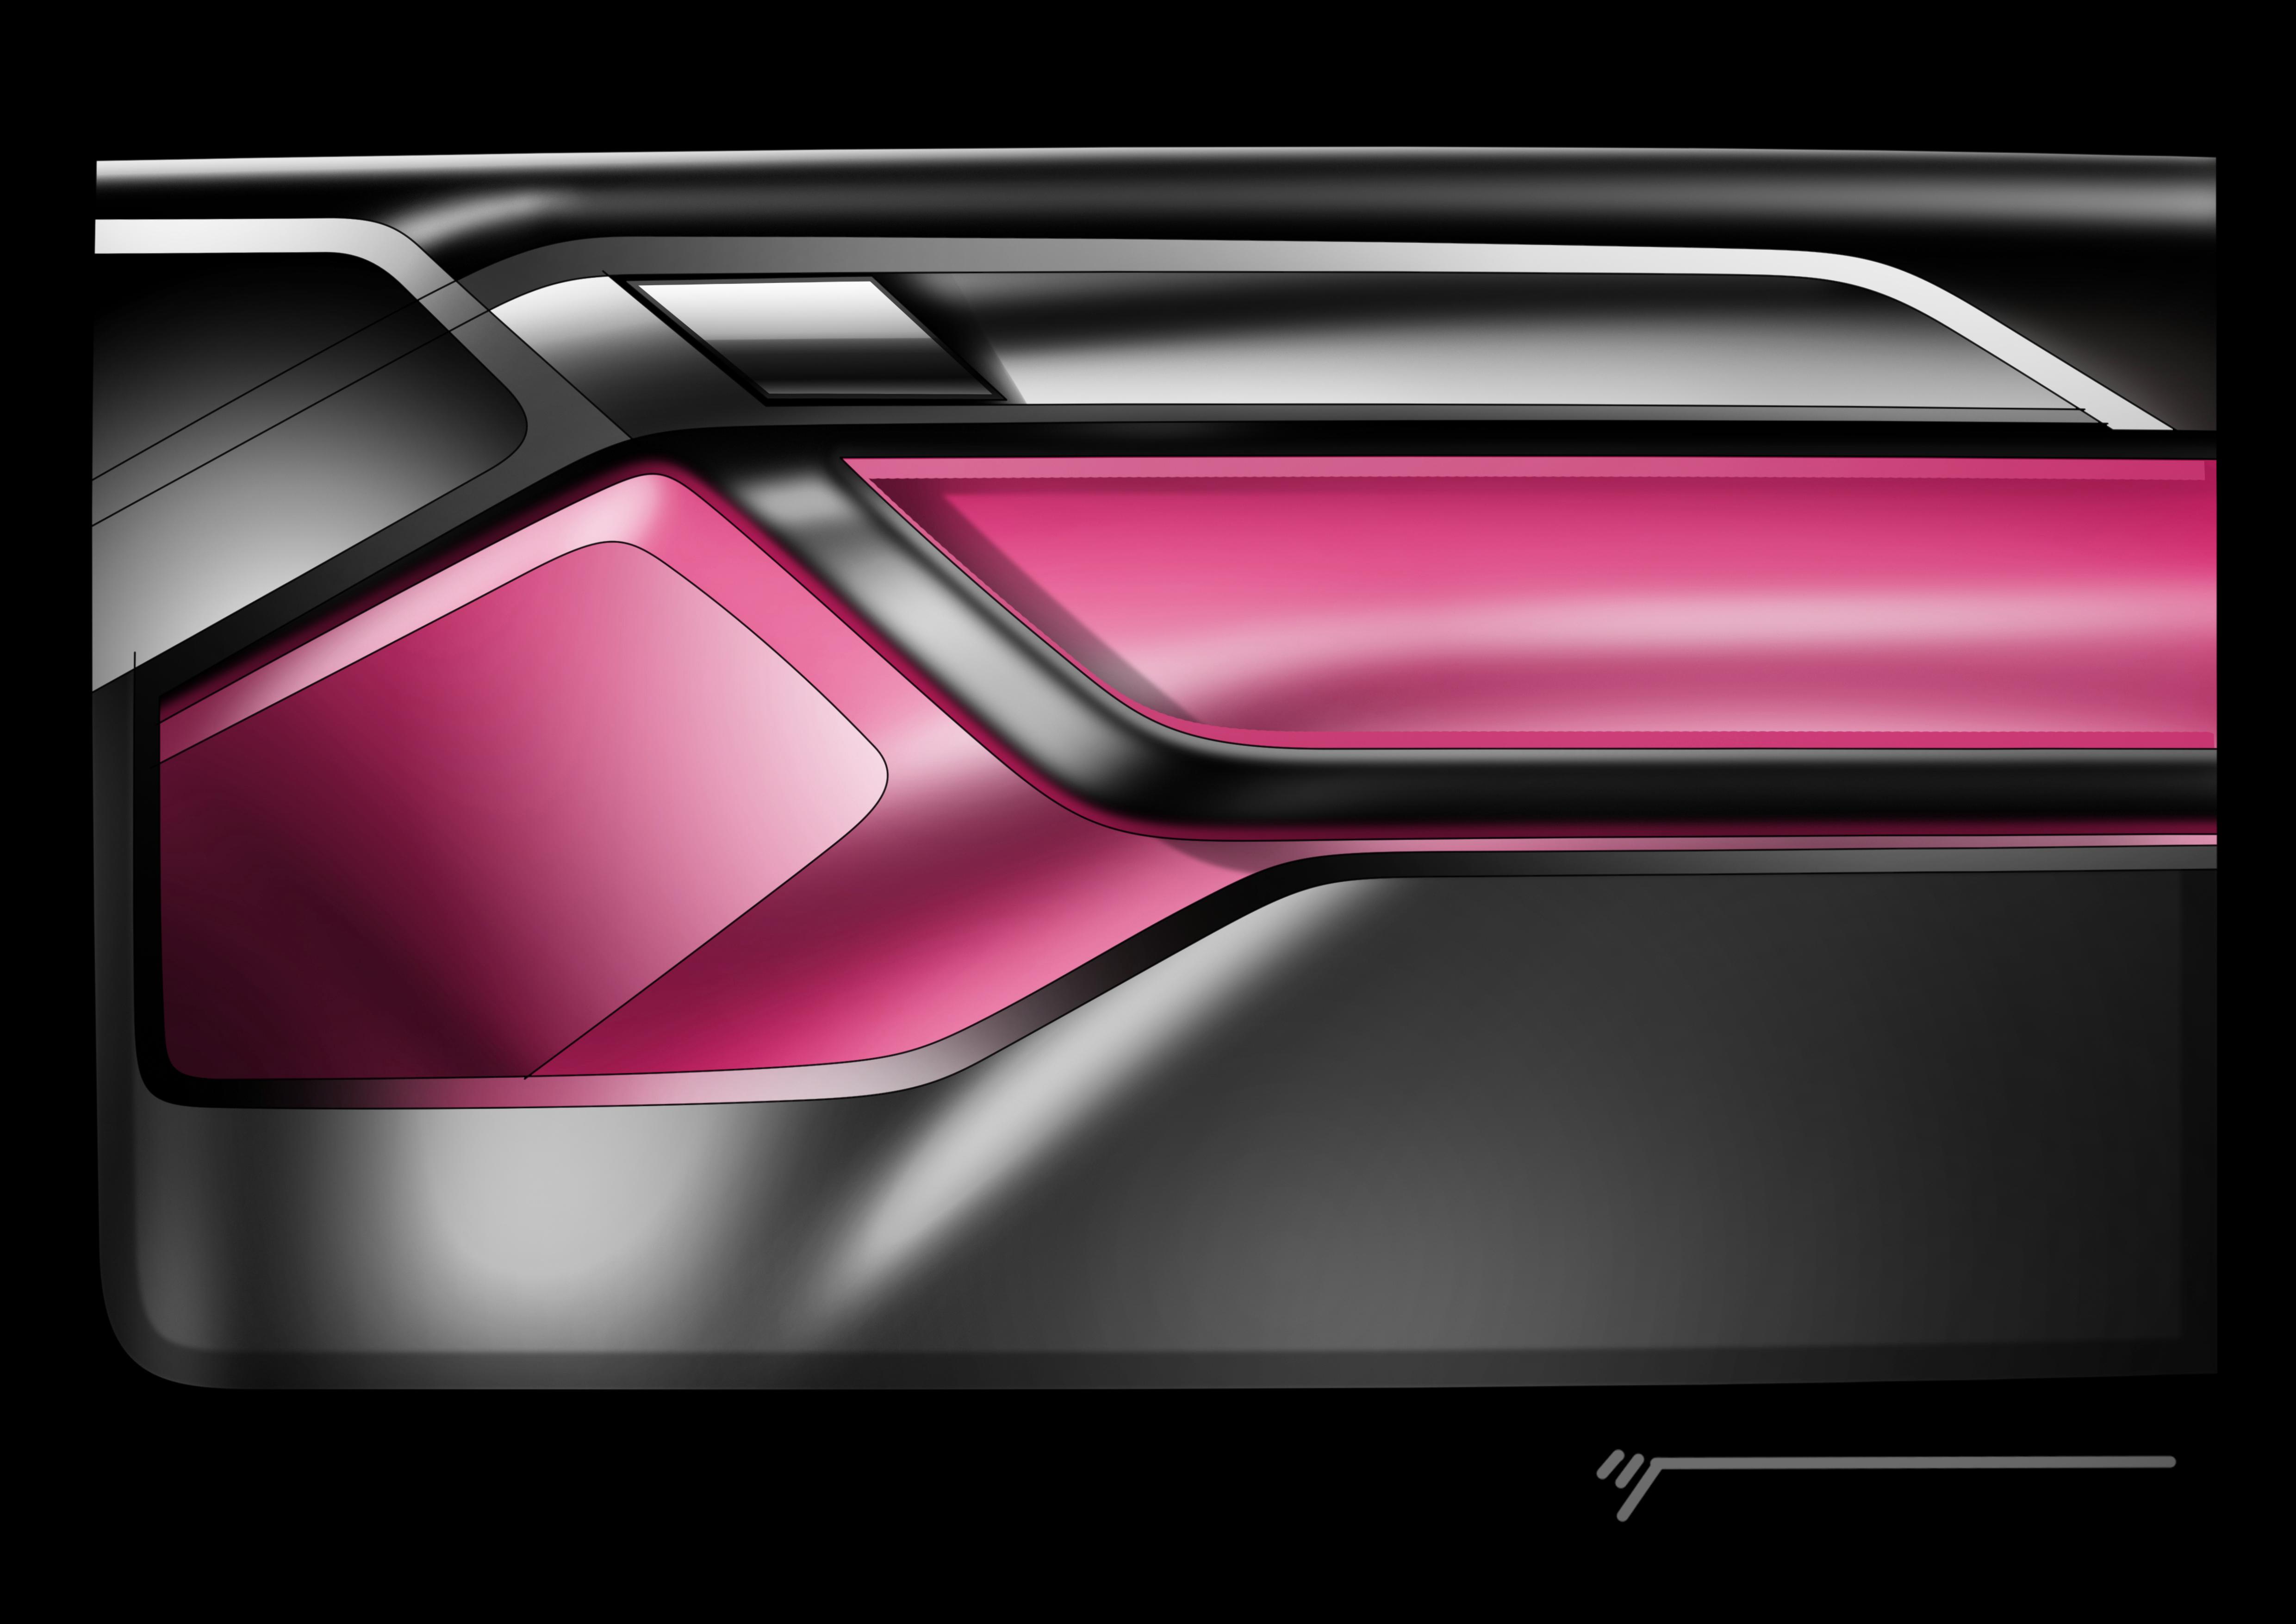 Automotive interior design study door panel for Car interior door panel designs